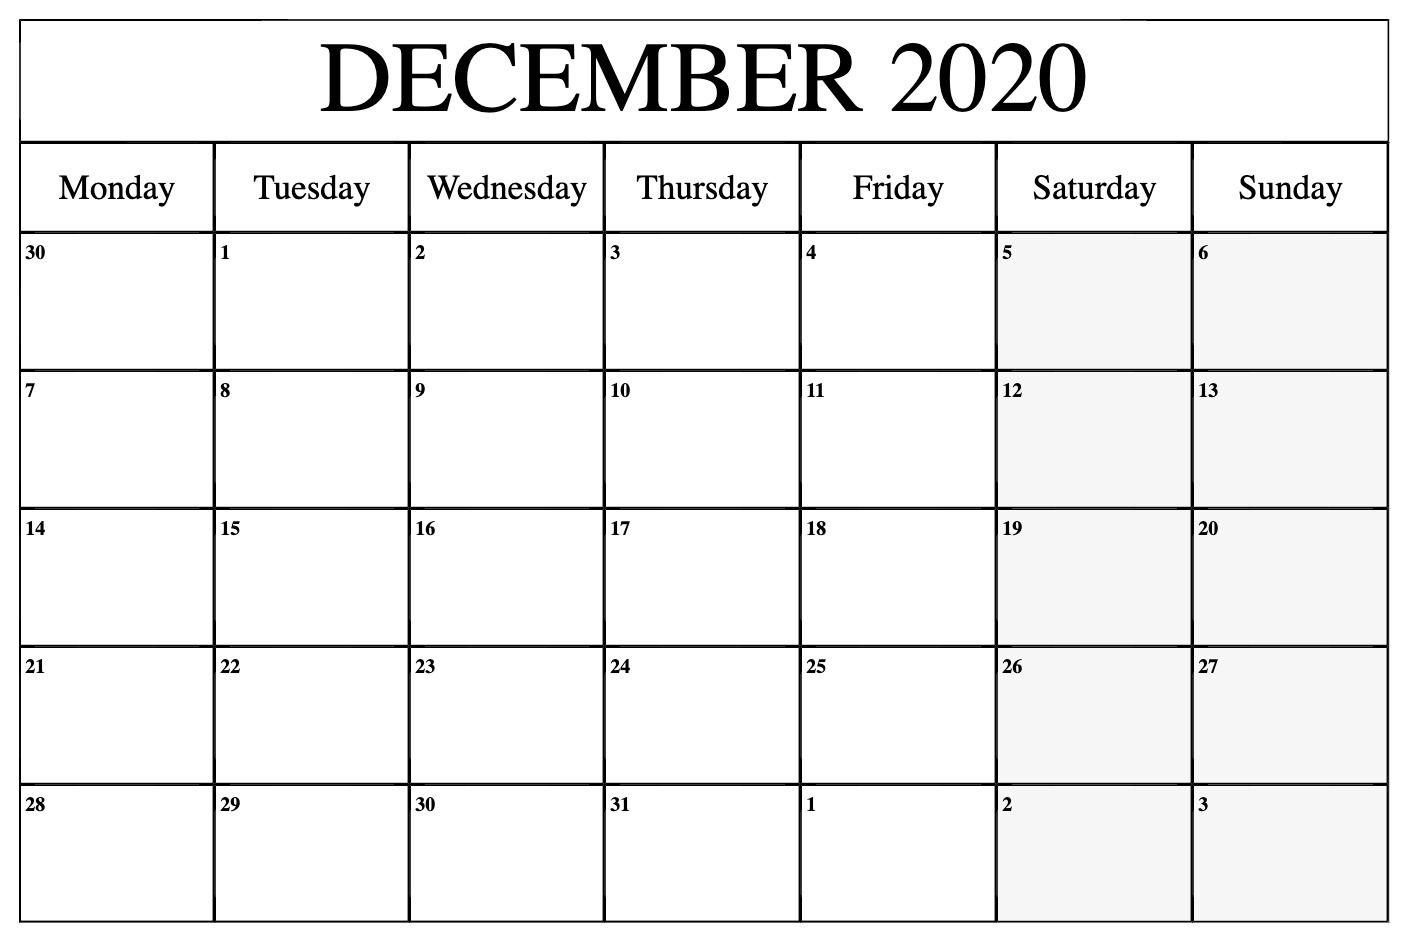 December 2020 Calendar Printable Template With Holidays ...